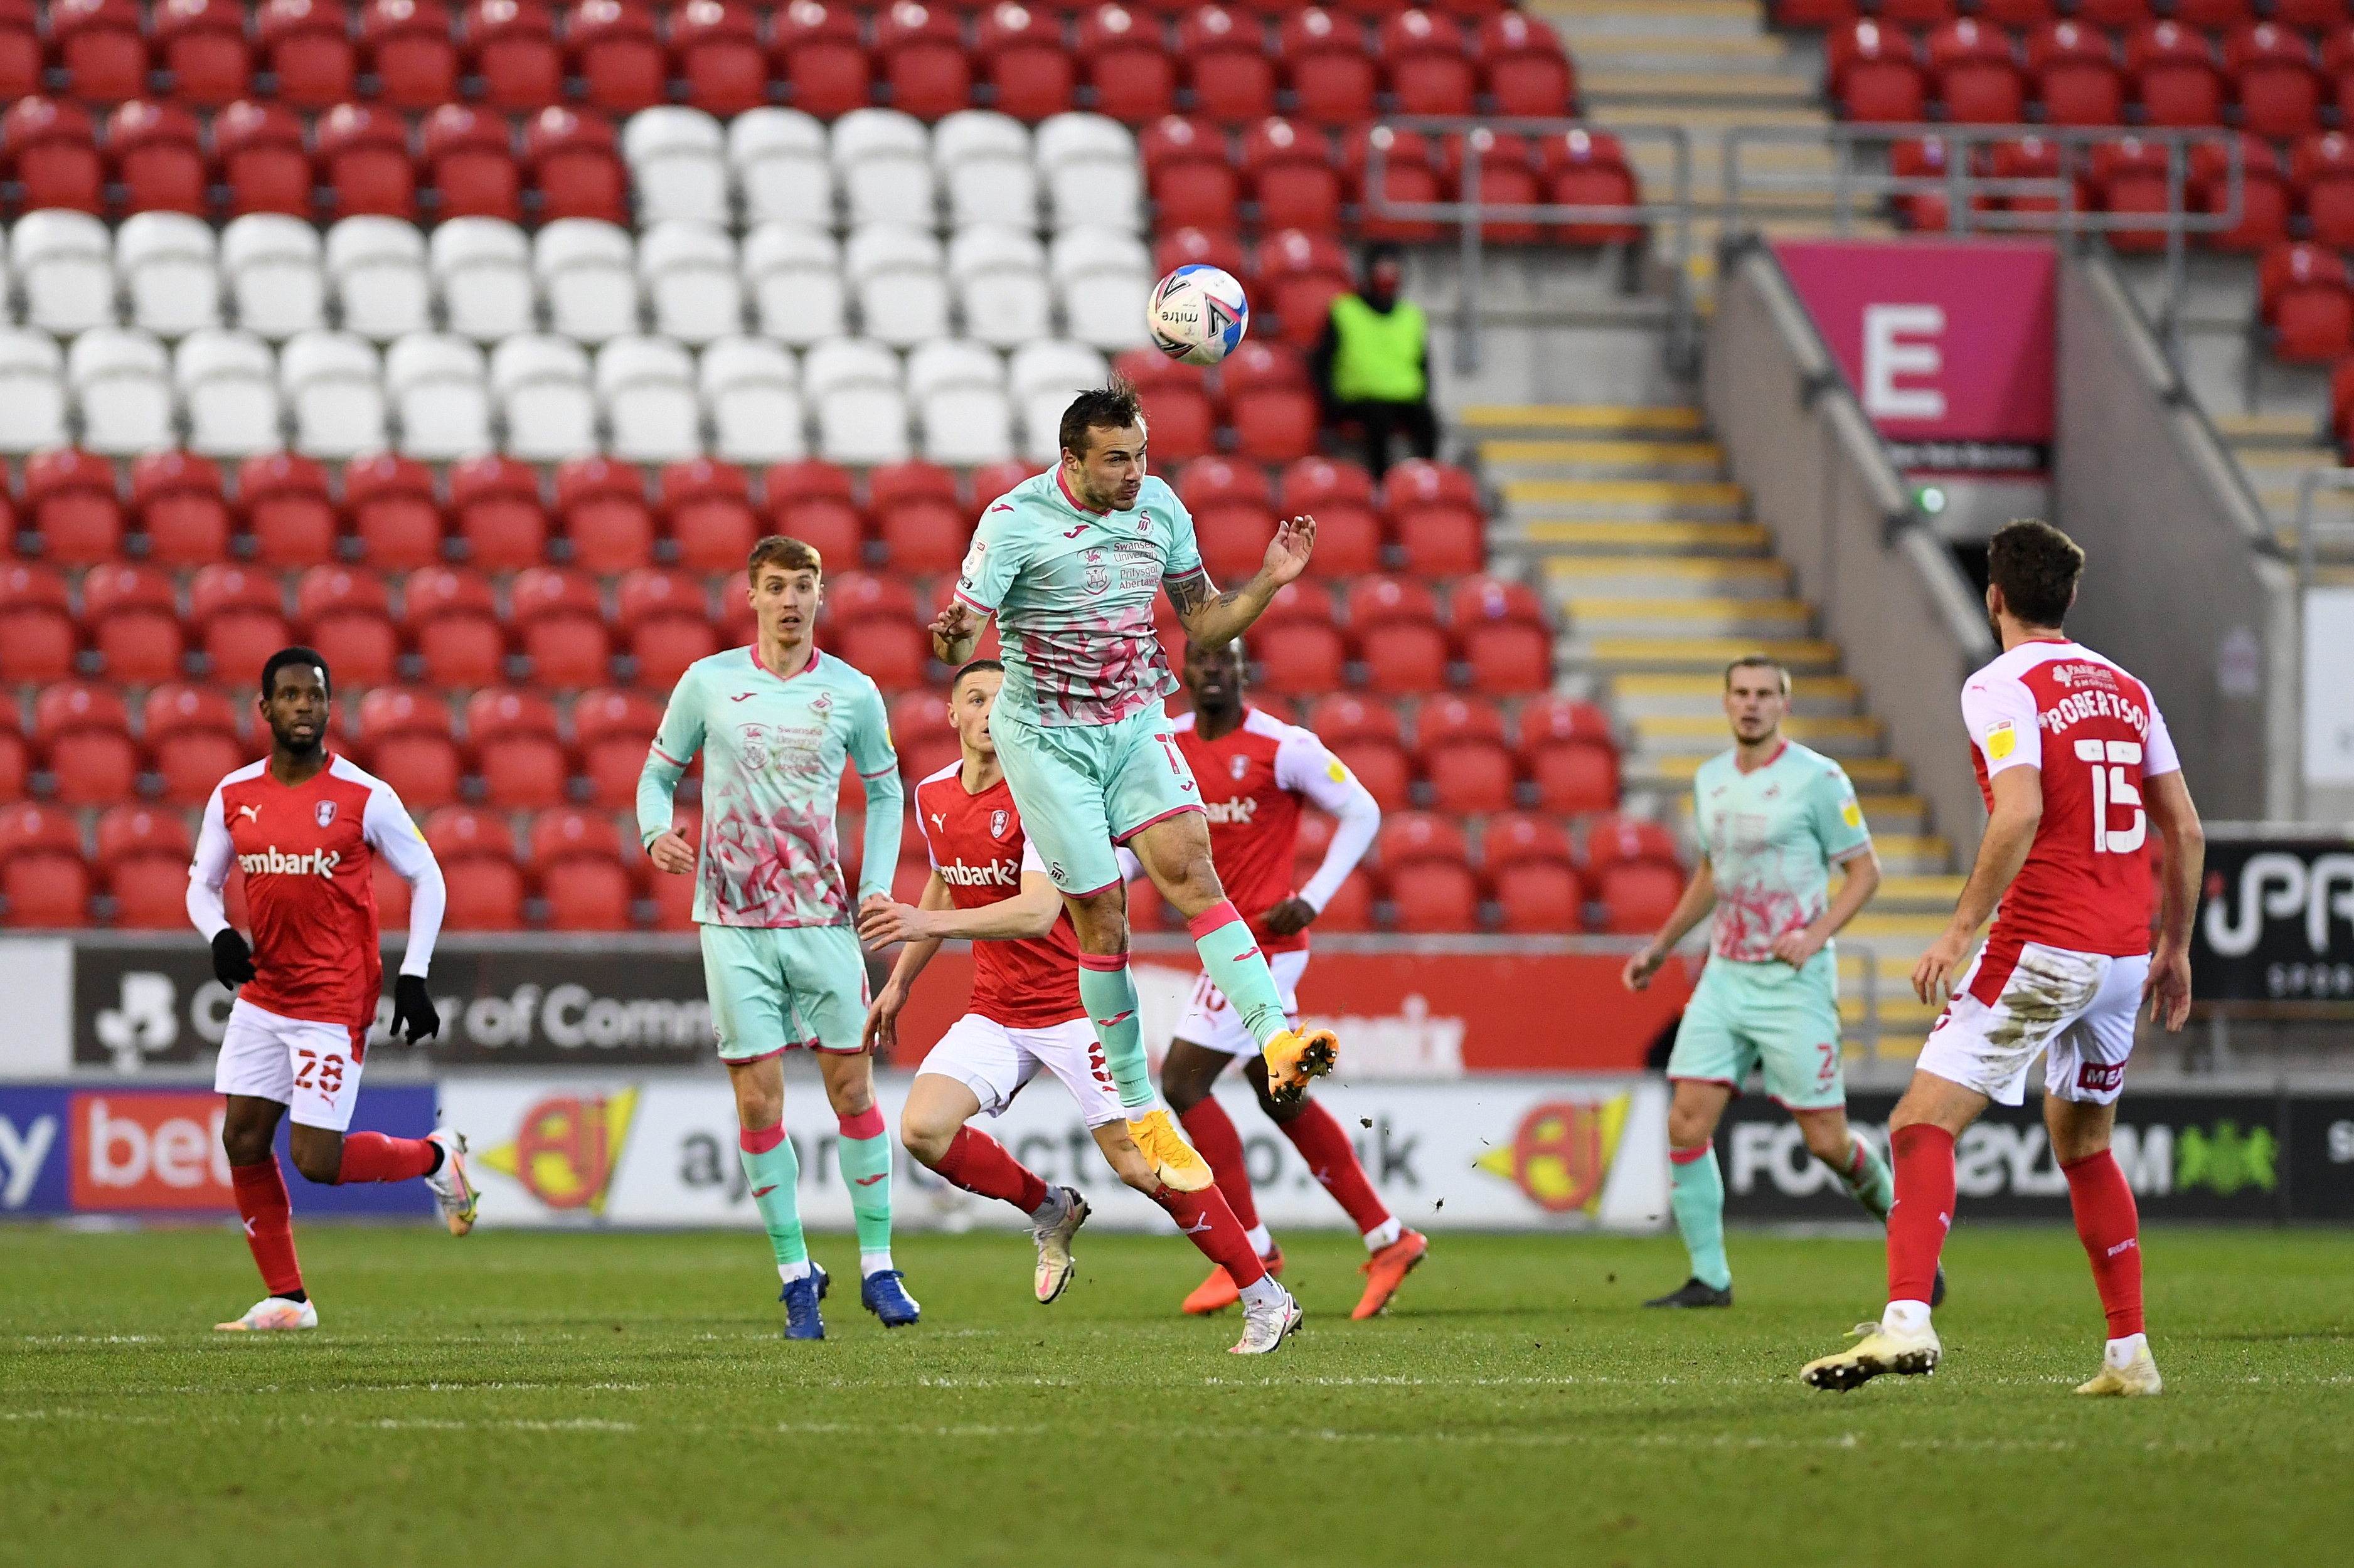 Rotherham United v Swansea City - Sky Bet Championship